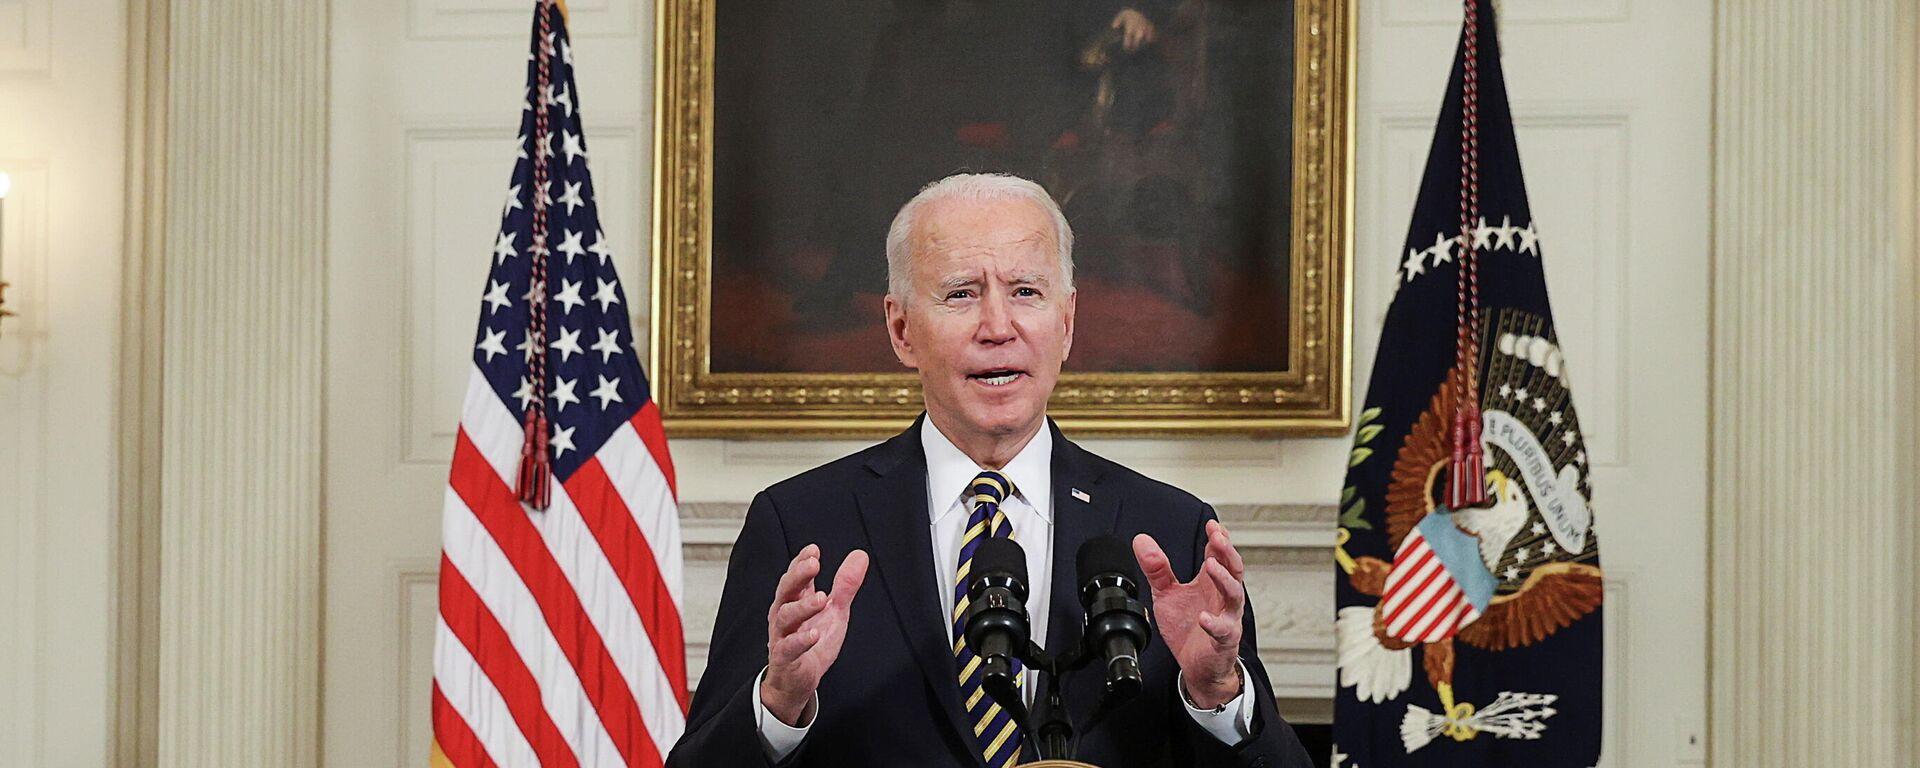 Joe Biden, presidente de EEUU - Sputnik Mundo, 1920, 09.03.2021